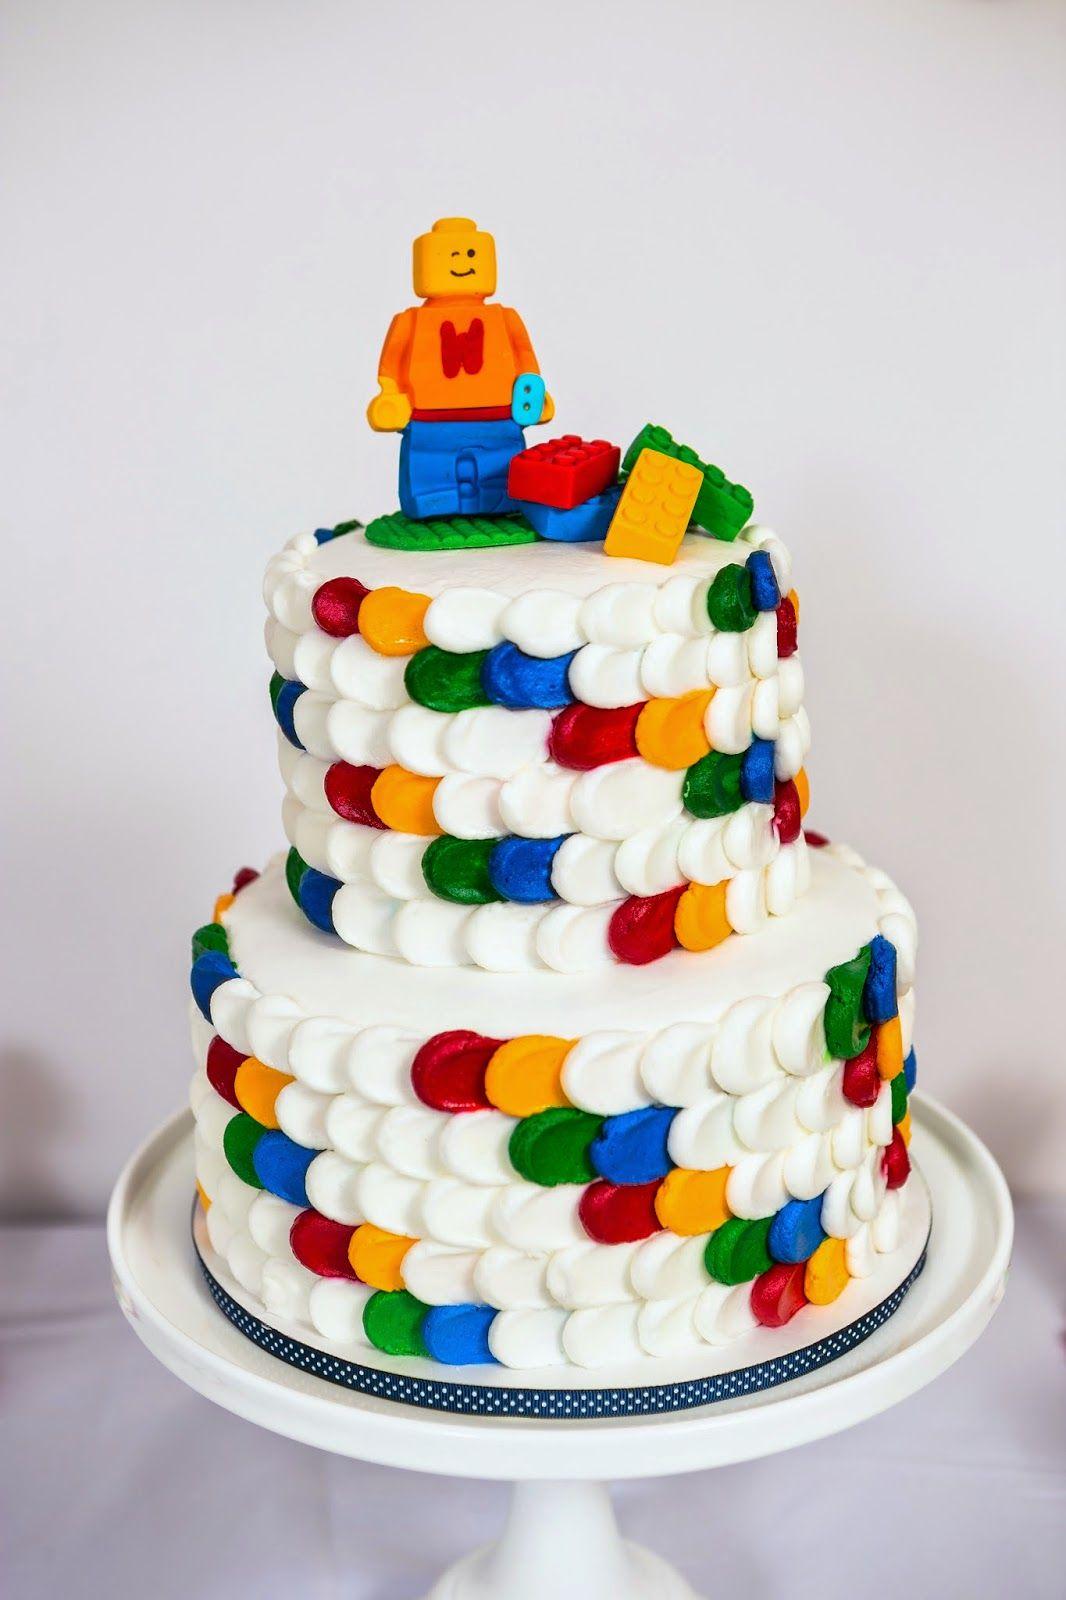 Handmade Legoman and 10 bricks Edible Personalised Cake Topper